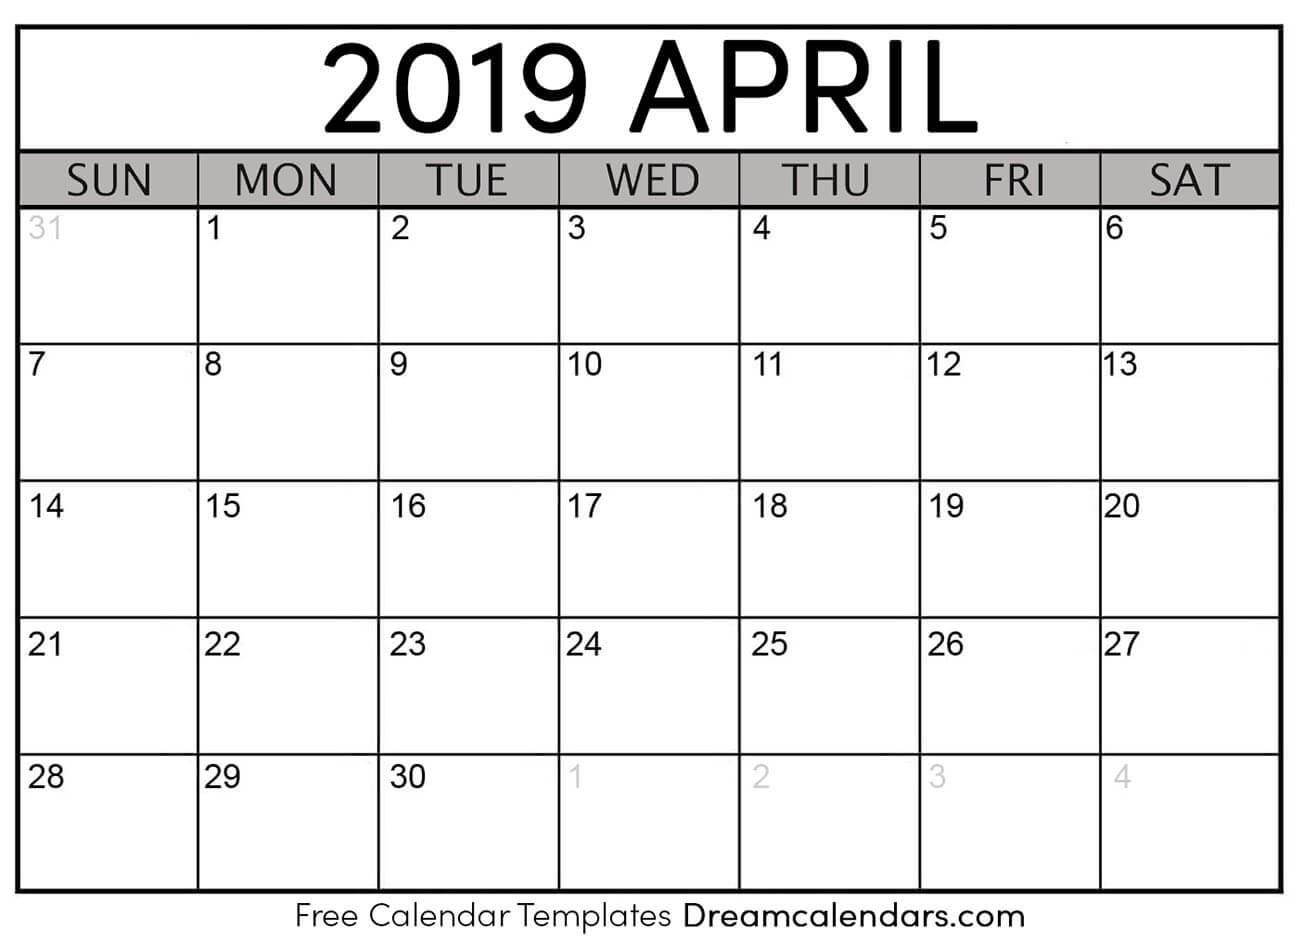 2019 2019 Academic Calendar Printable Printable April 2019 Calendar Templates – Helena orstem